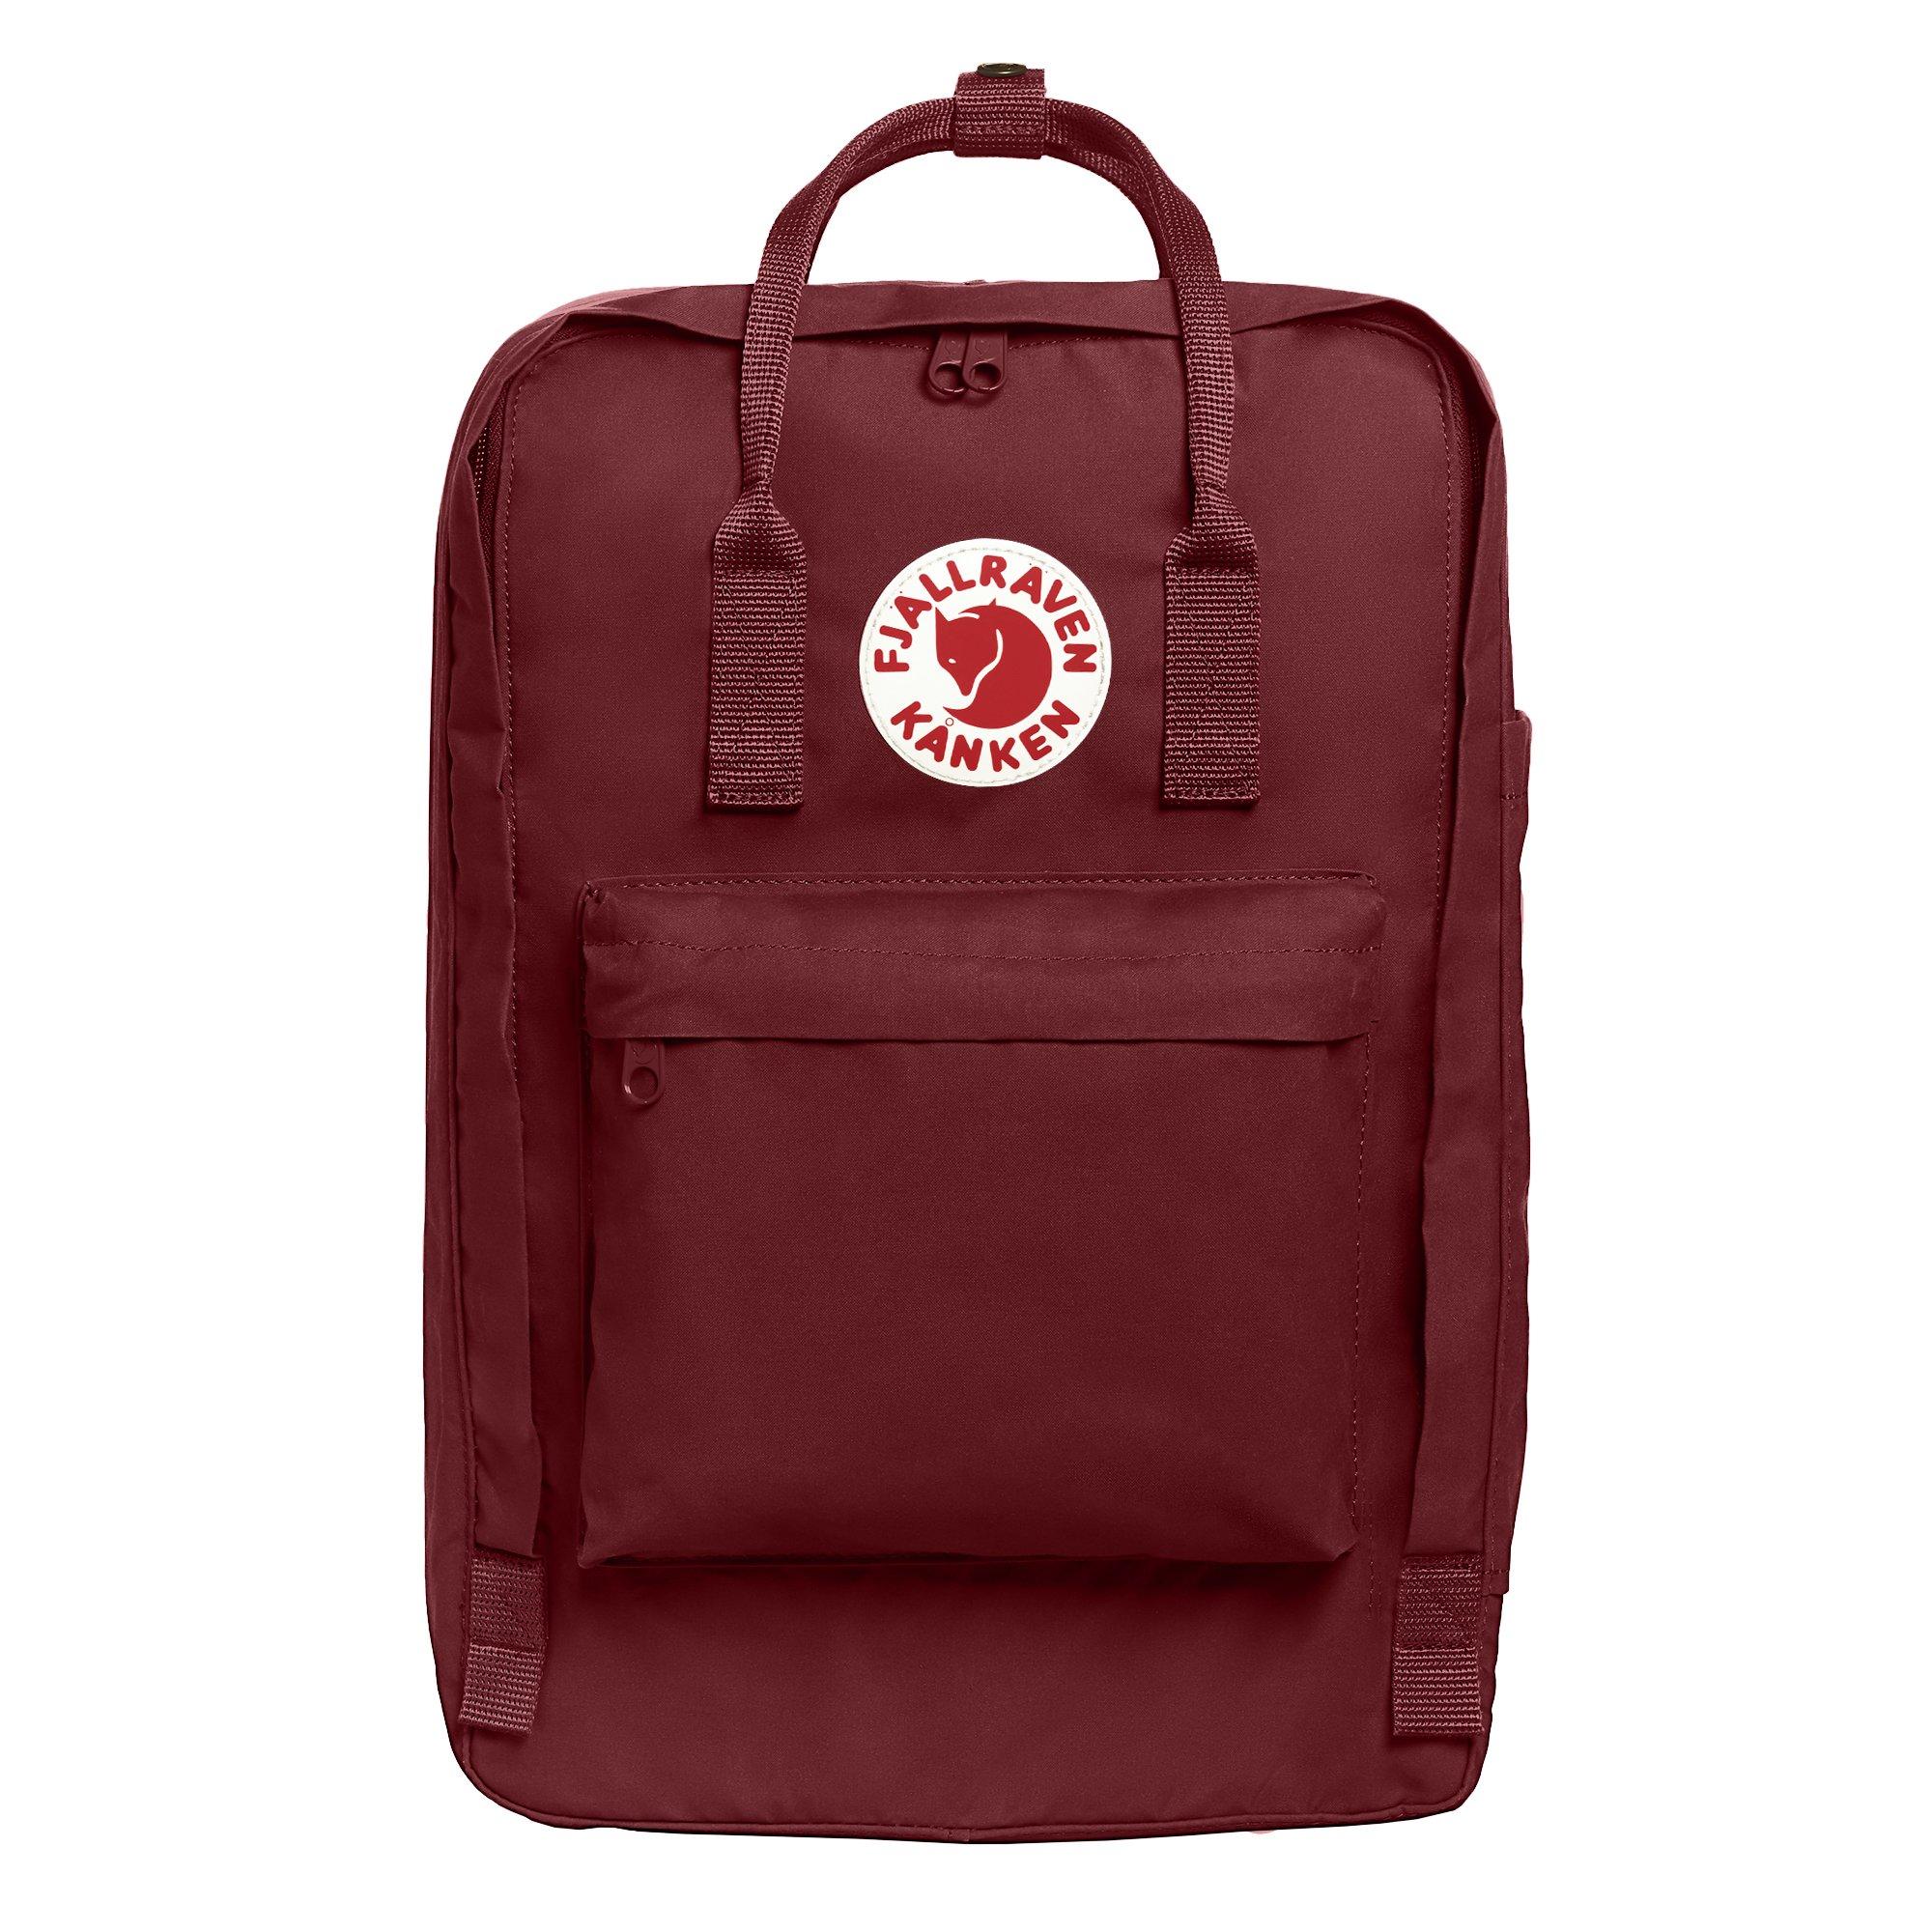 Fjallraven - Kanken Laptop 17'' Backpack for Everyday, Ox Red by Fjallraven